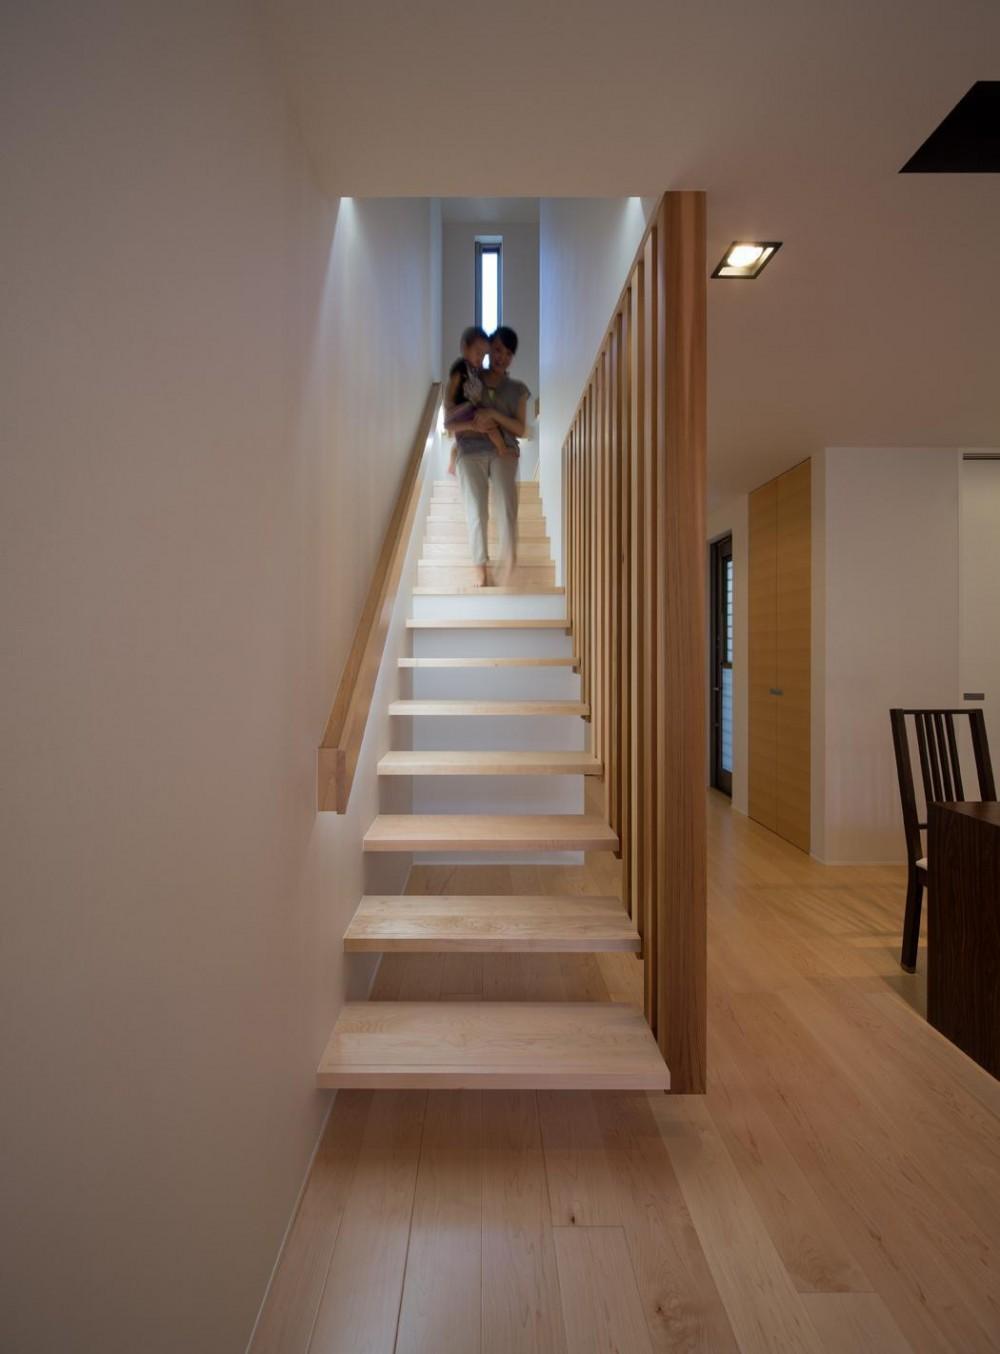 Y2-house・Y3-house 「縦と横の家」 (階段)